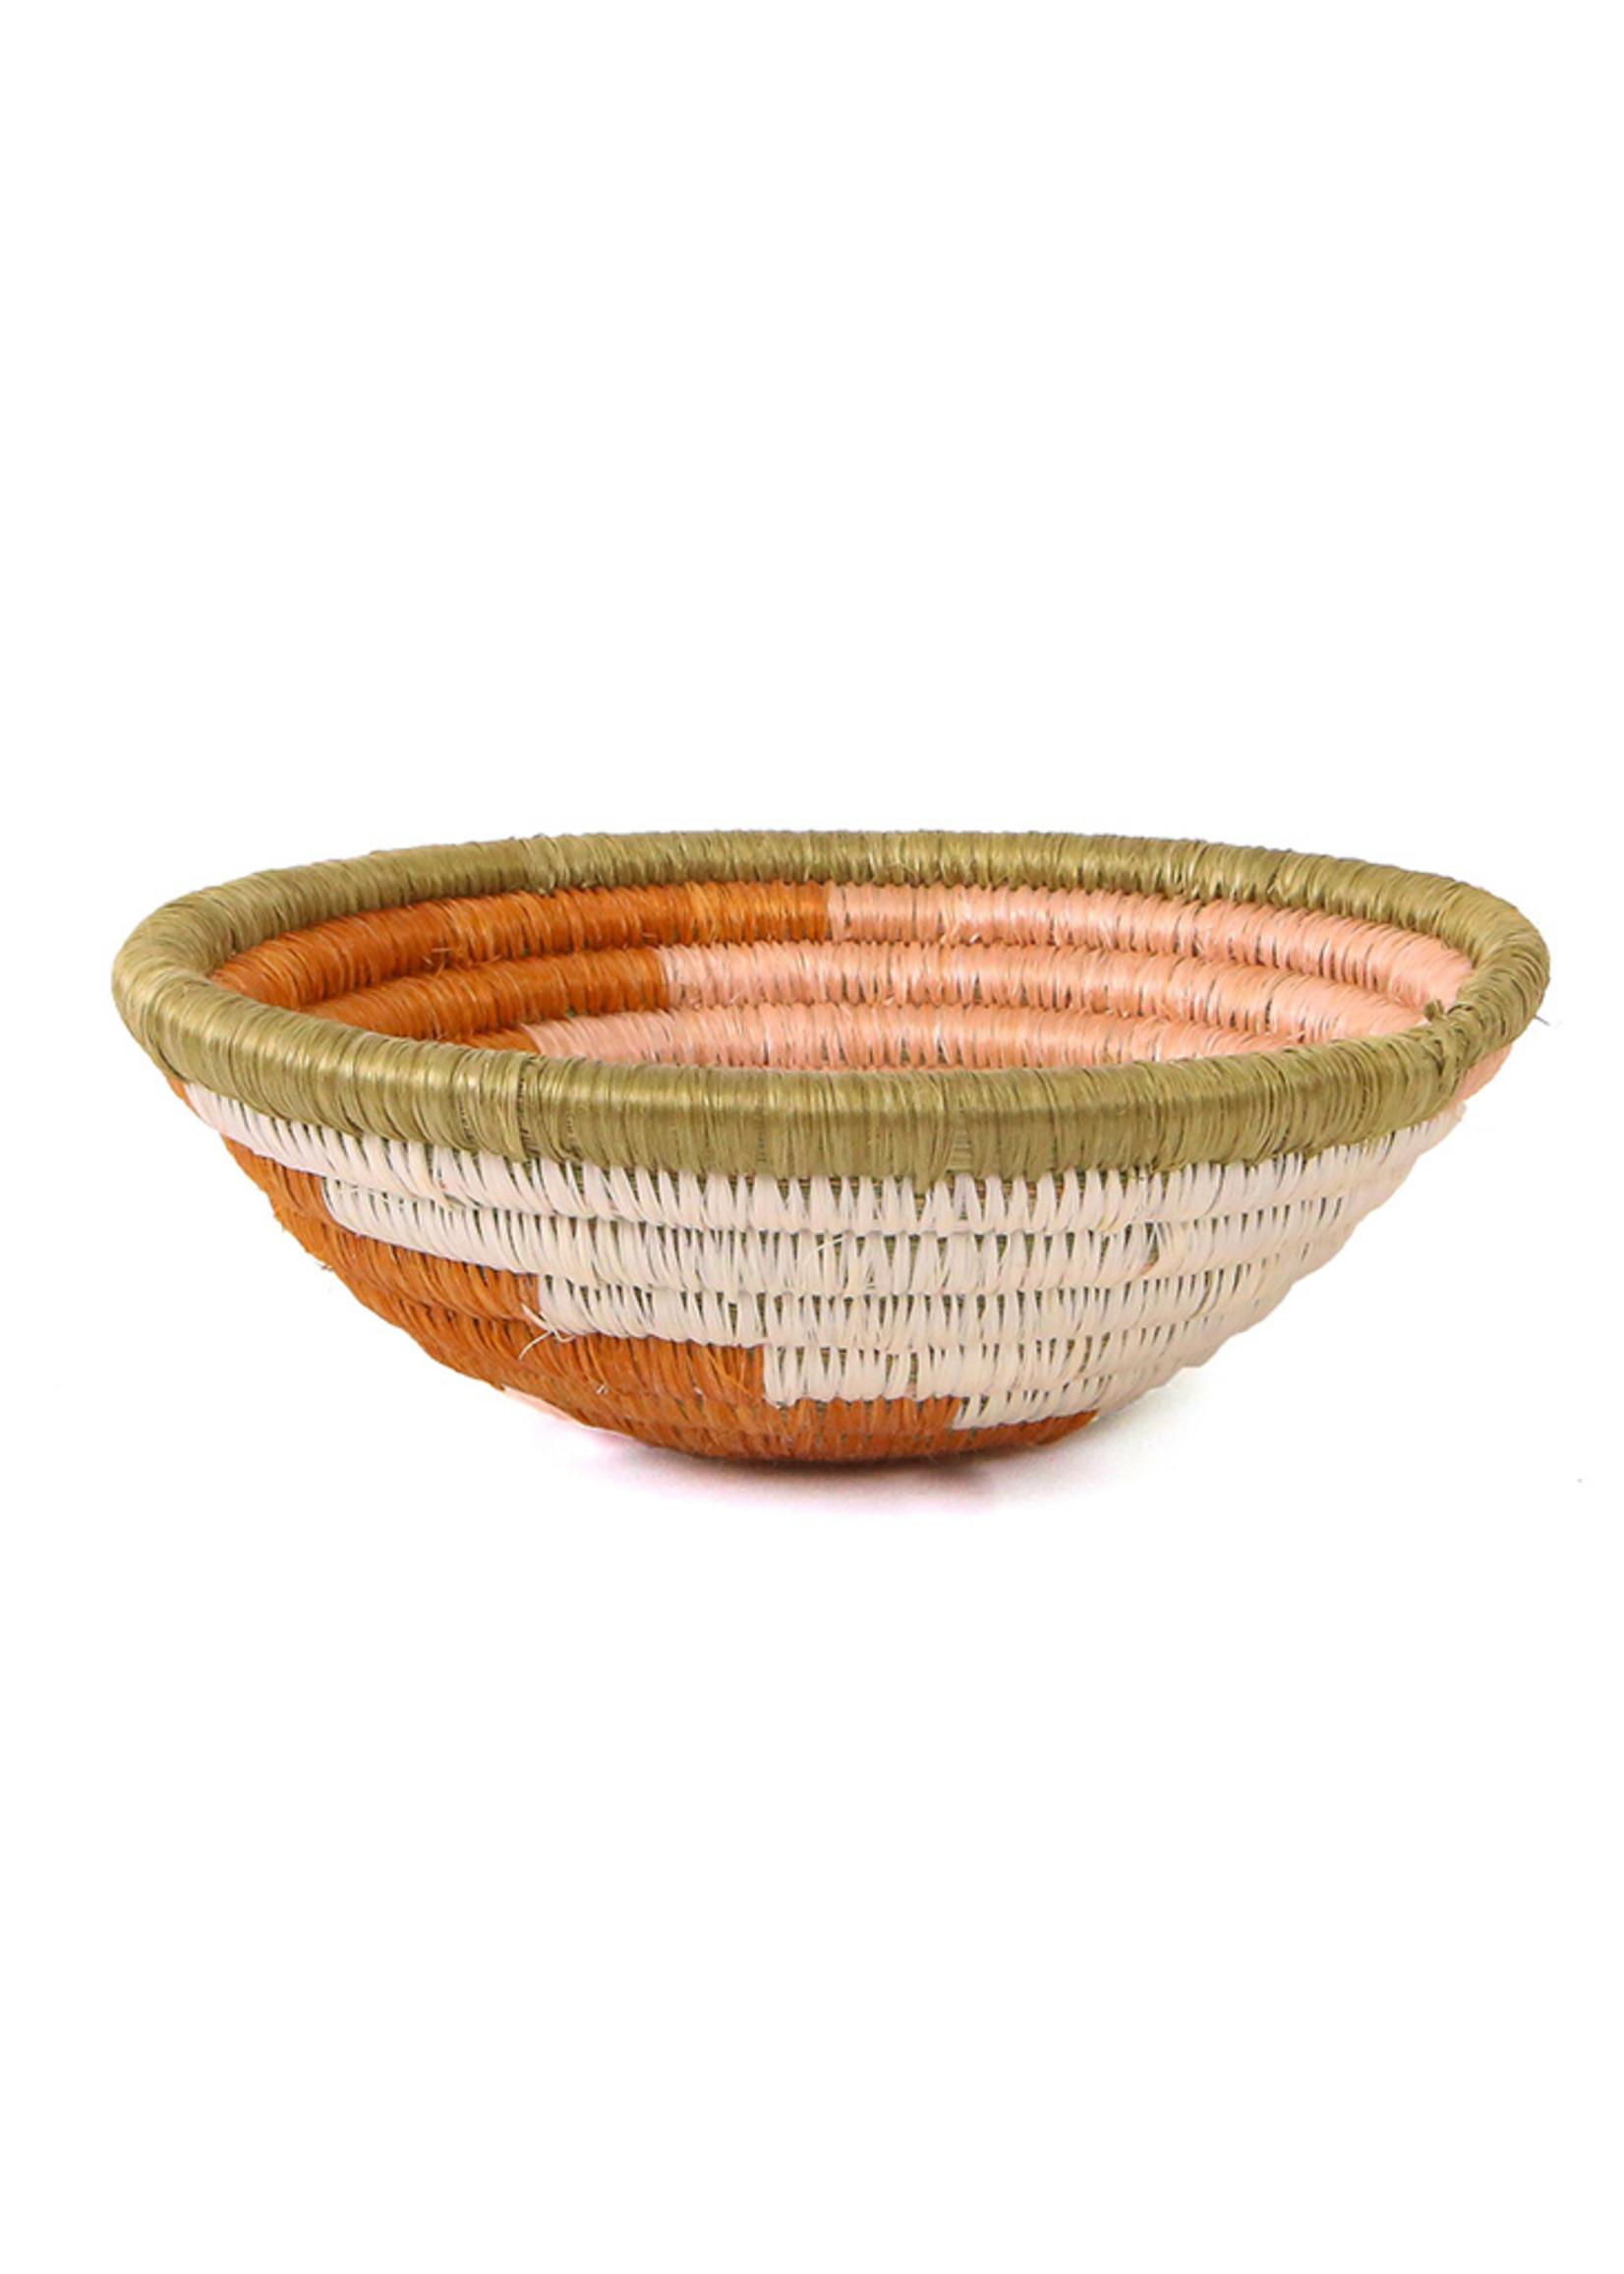 Kazi Small Canyon Clay Unity Basket